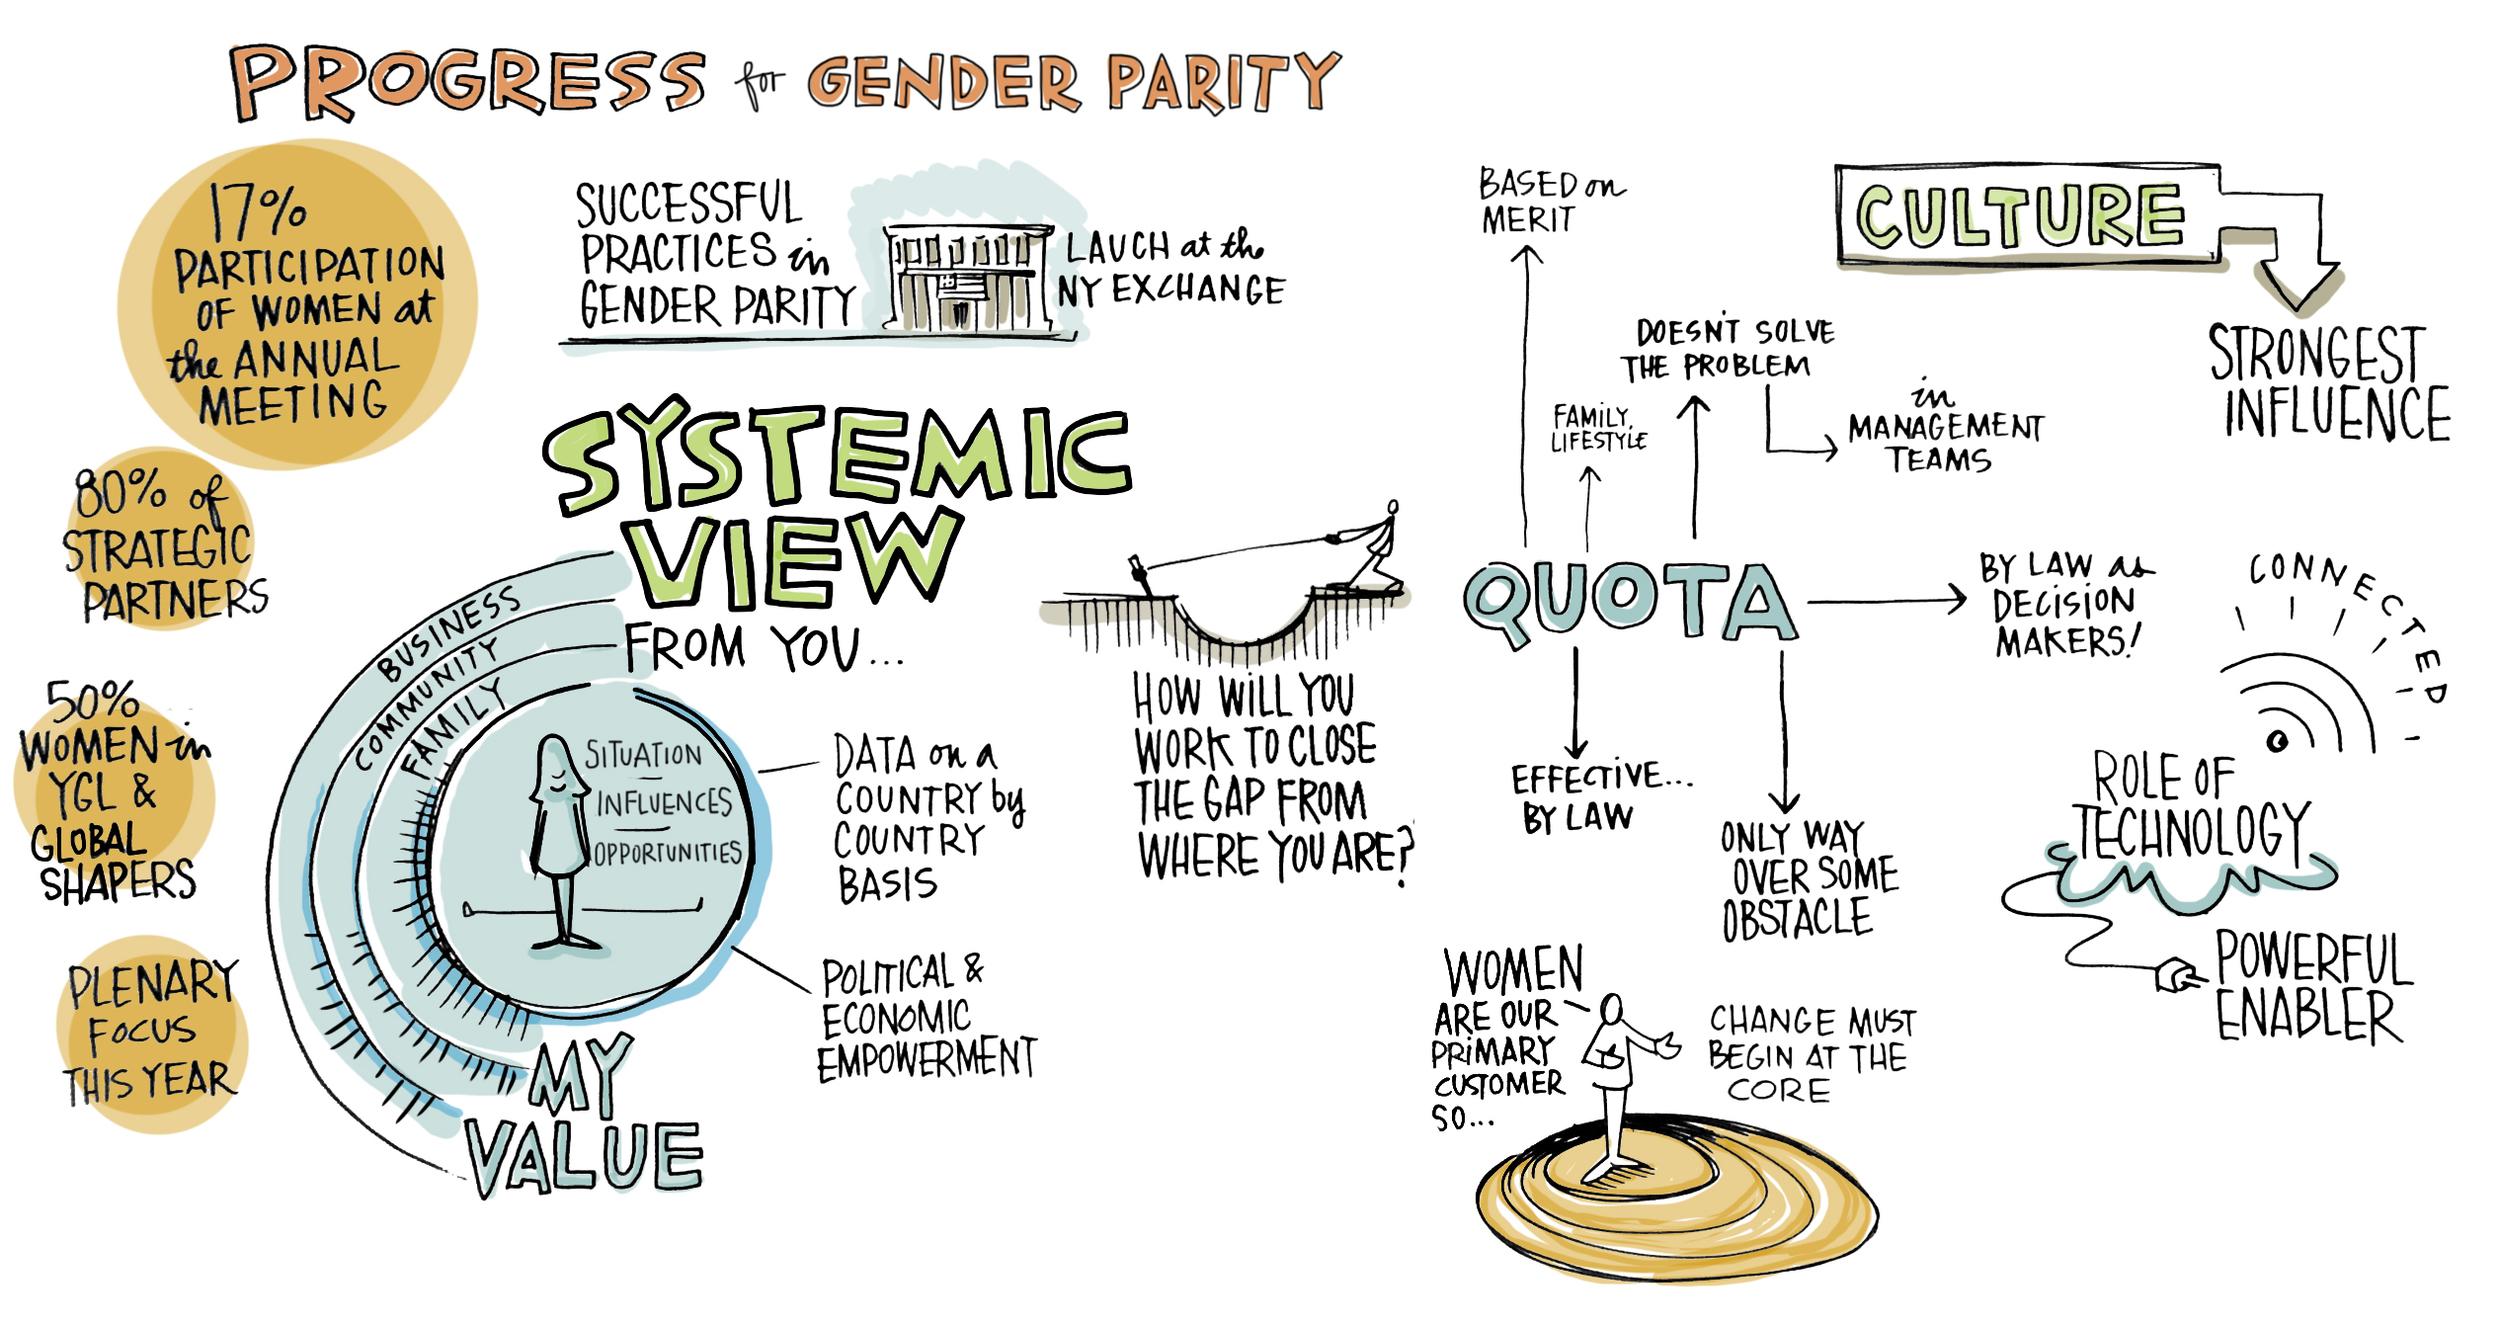 Genderparity_00